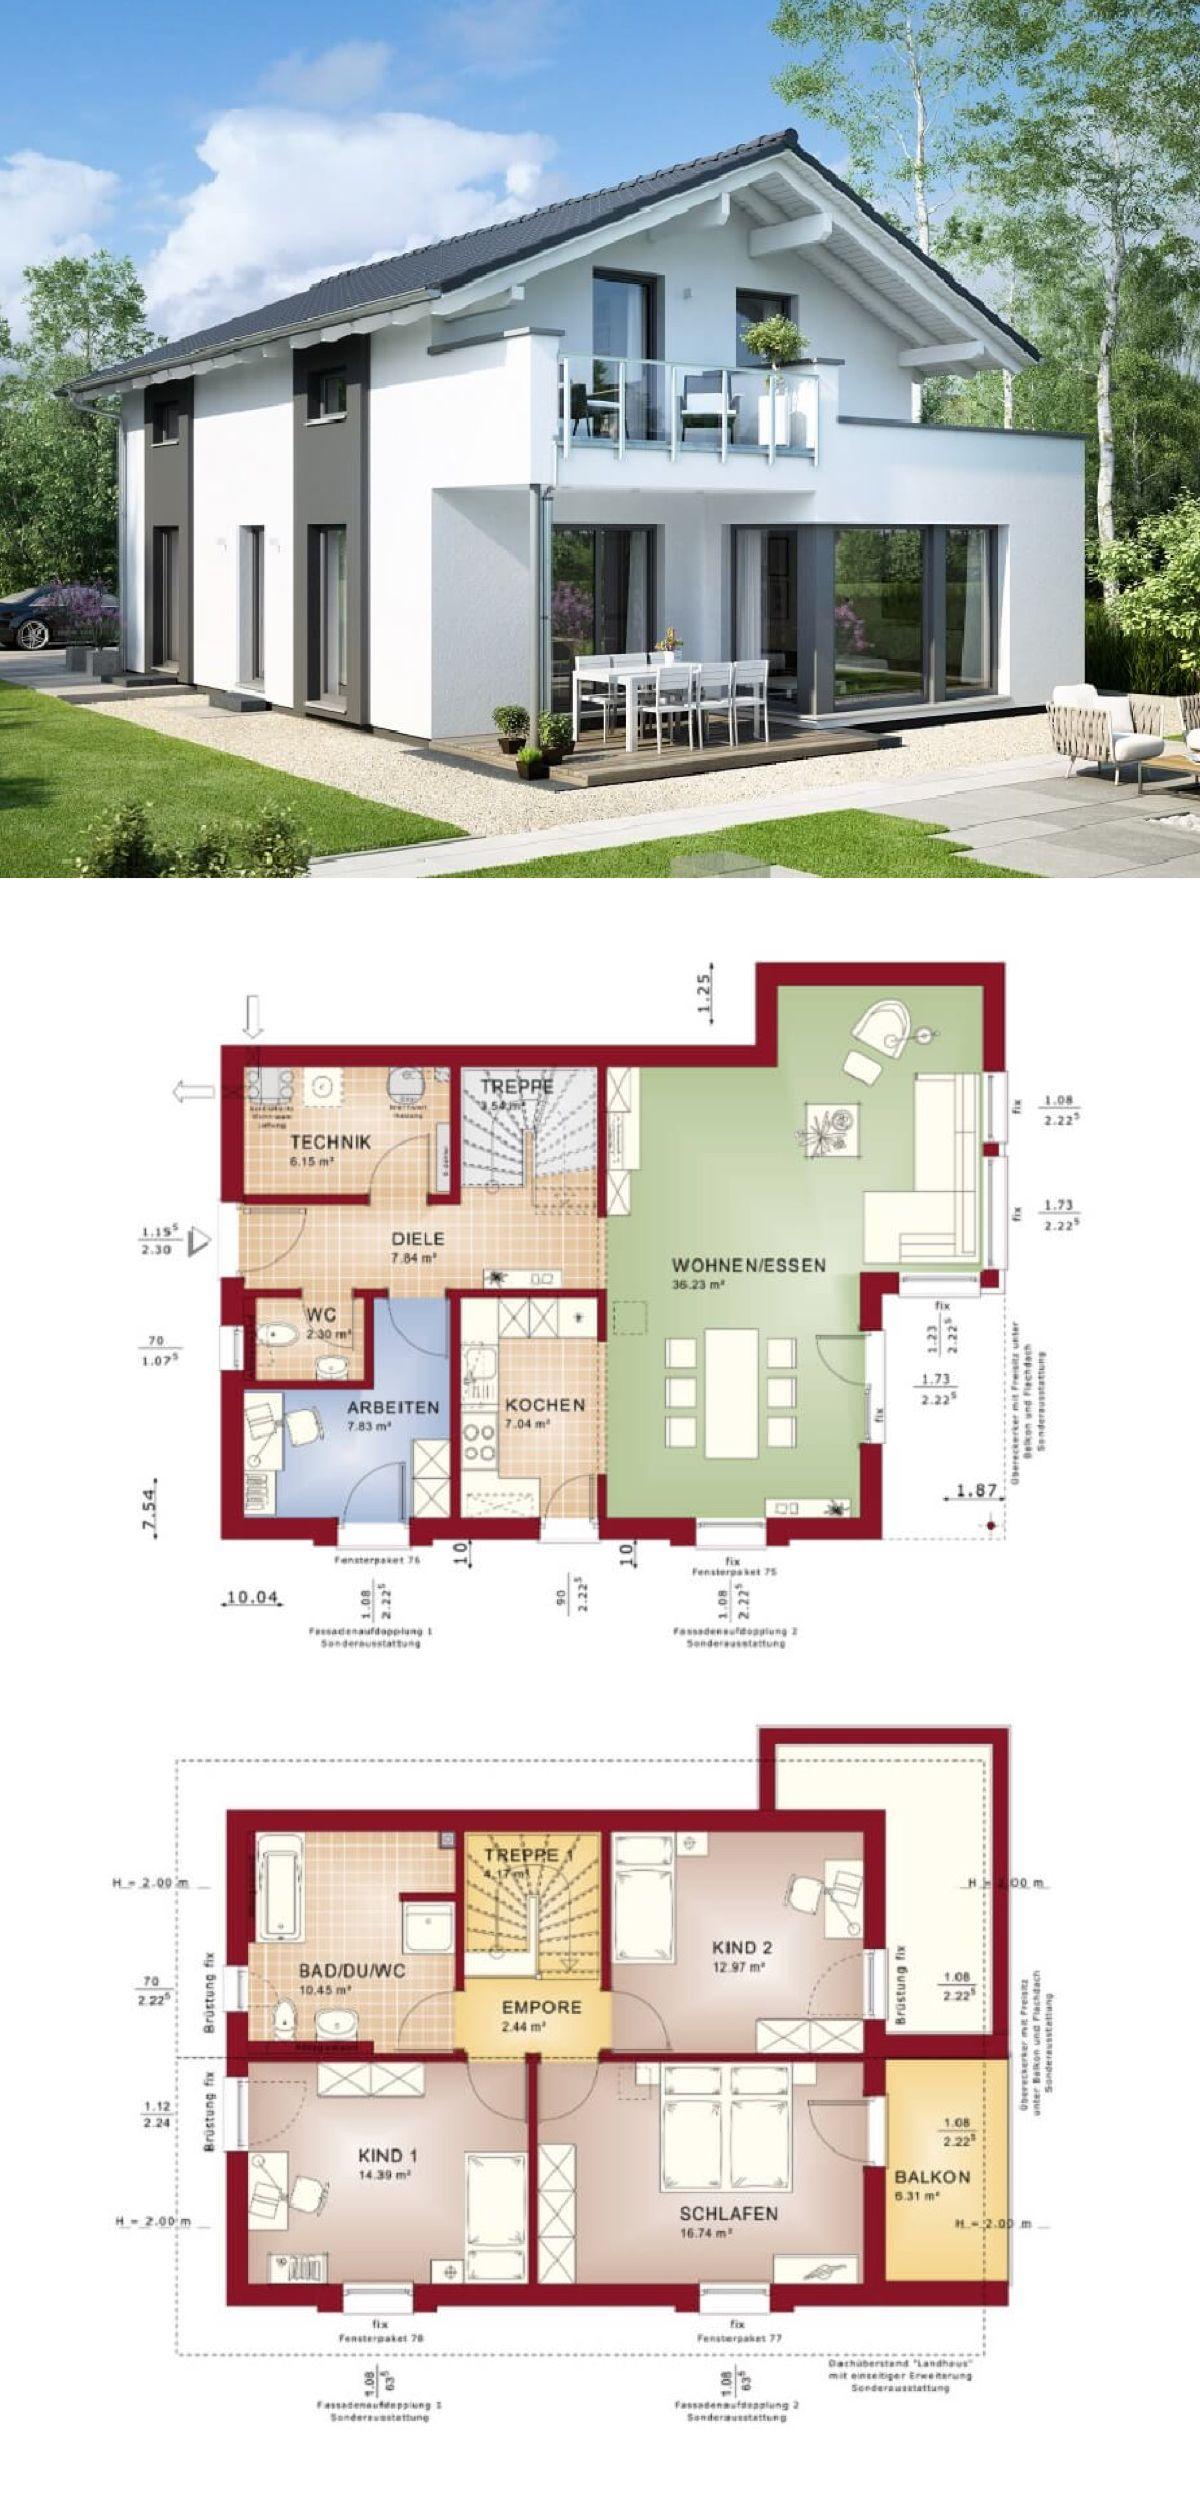 haus modern mit satteldach einfamilienhaus edition 2 v3 bien zenker fertighaus hausbaudirektde - Fertighausplne